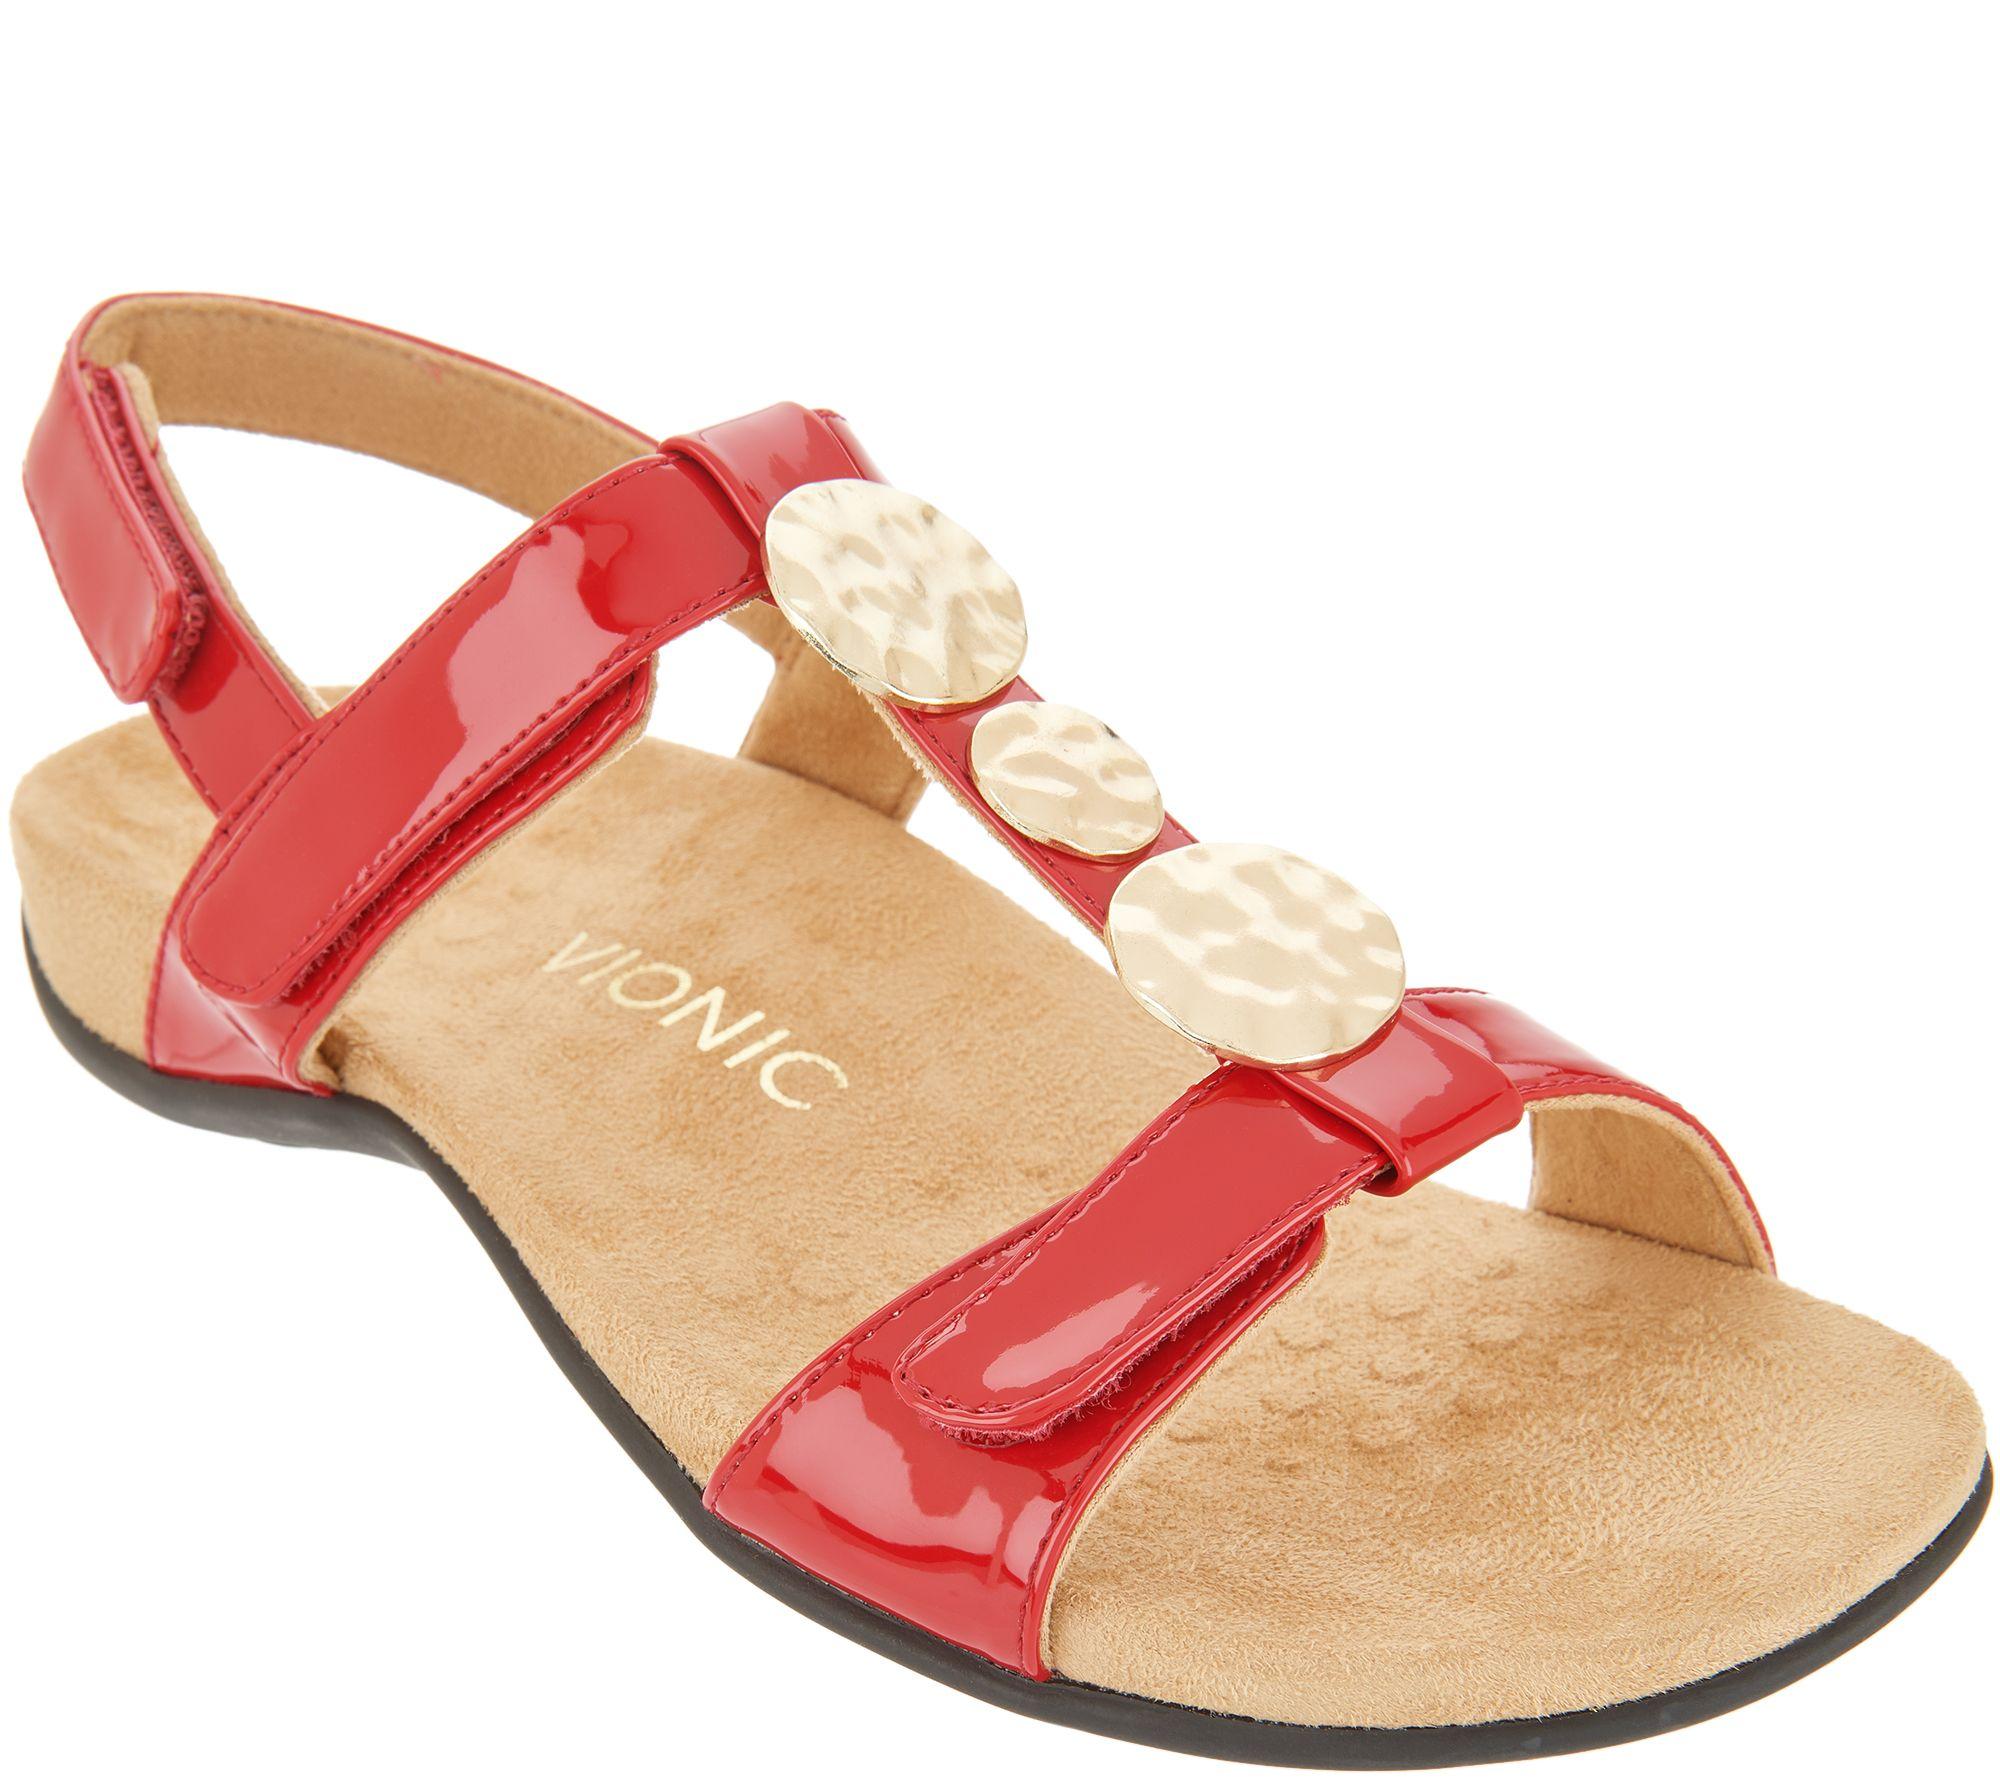 9e7db60a93 Vionic Embellished Sandals - Farra - Page 1 — QVC.com